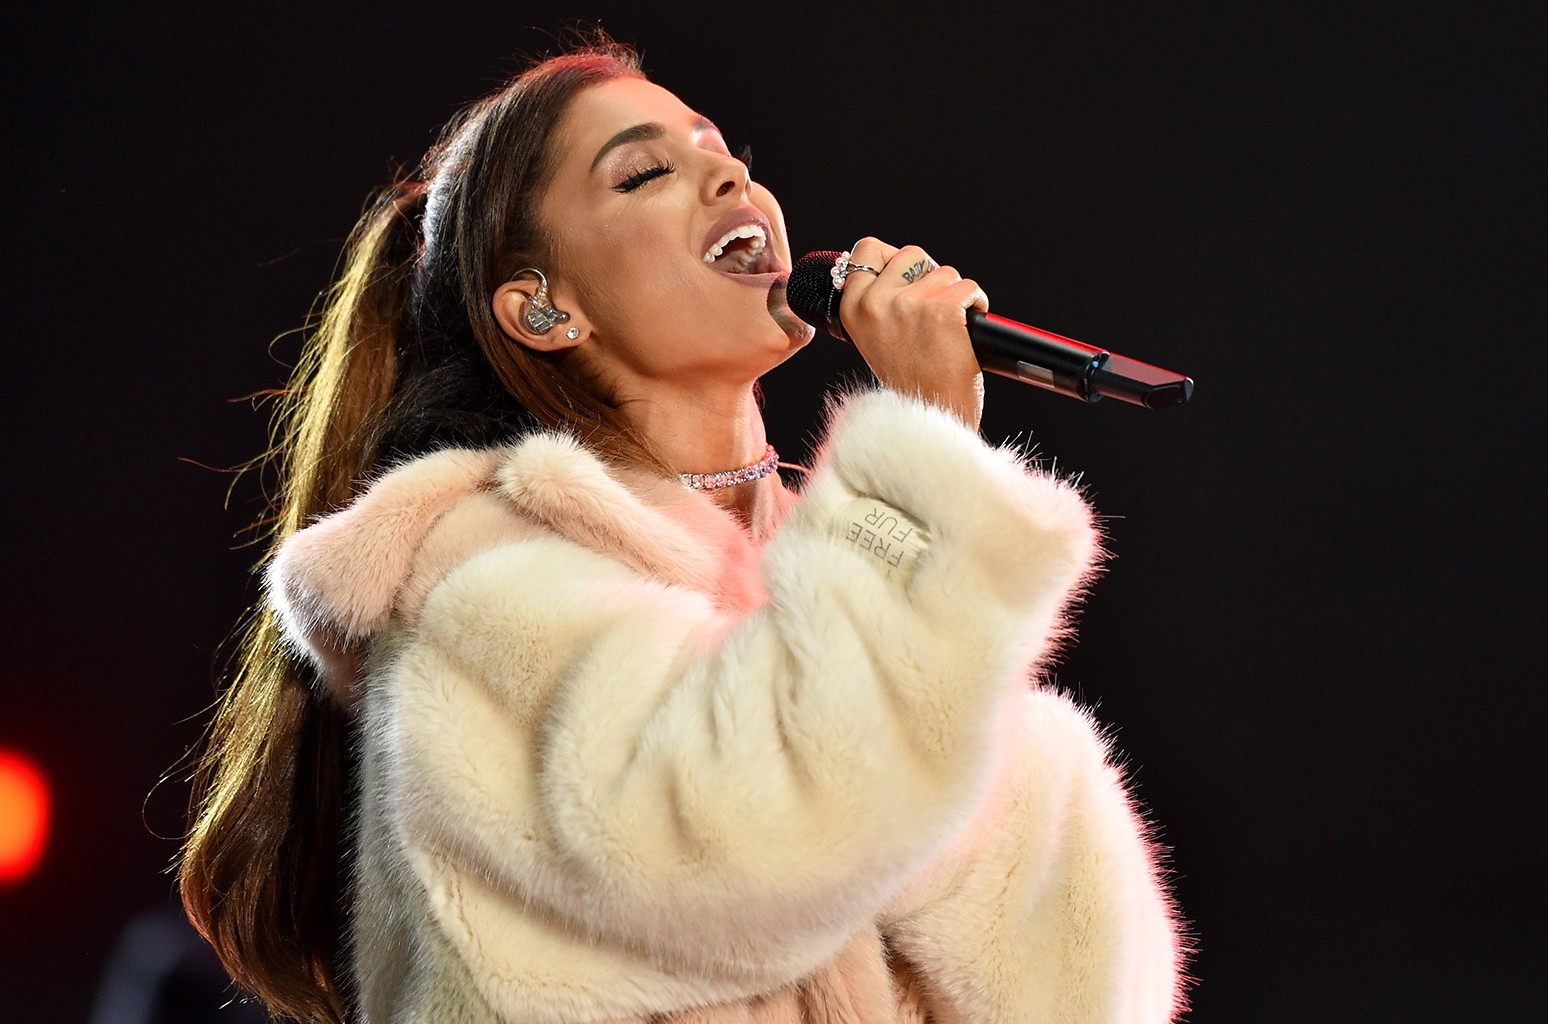 Ariana Grande performs at KIIS FM's Wango Tango 2016